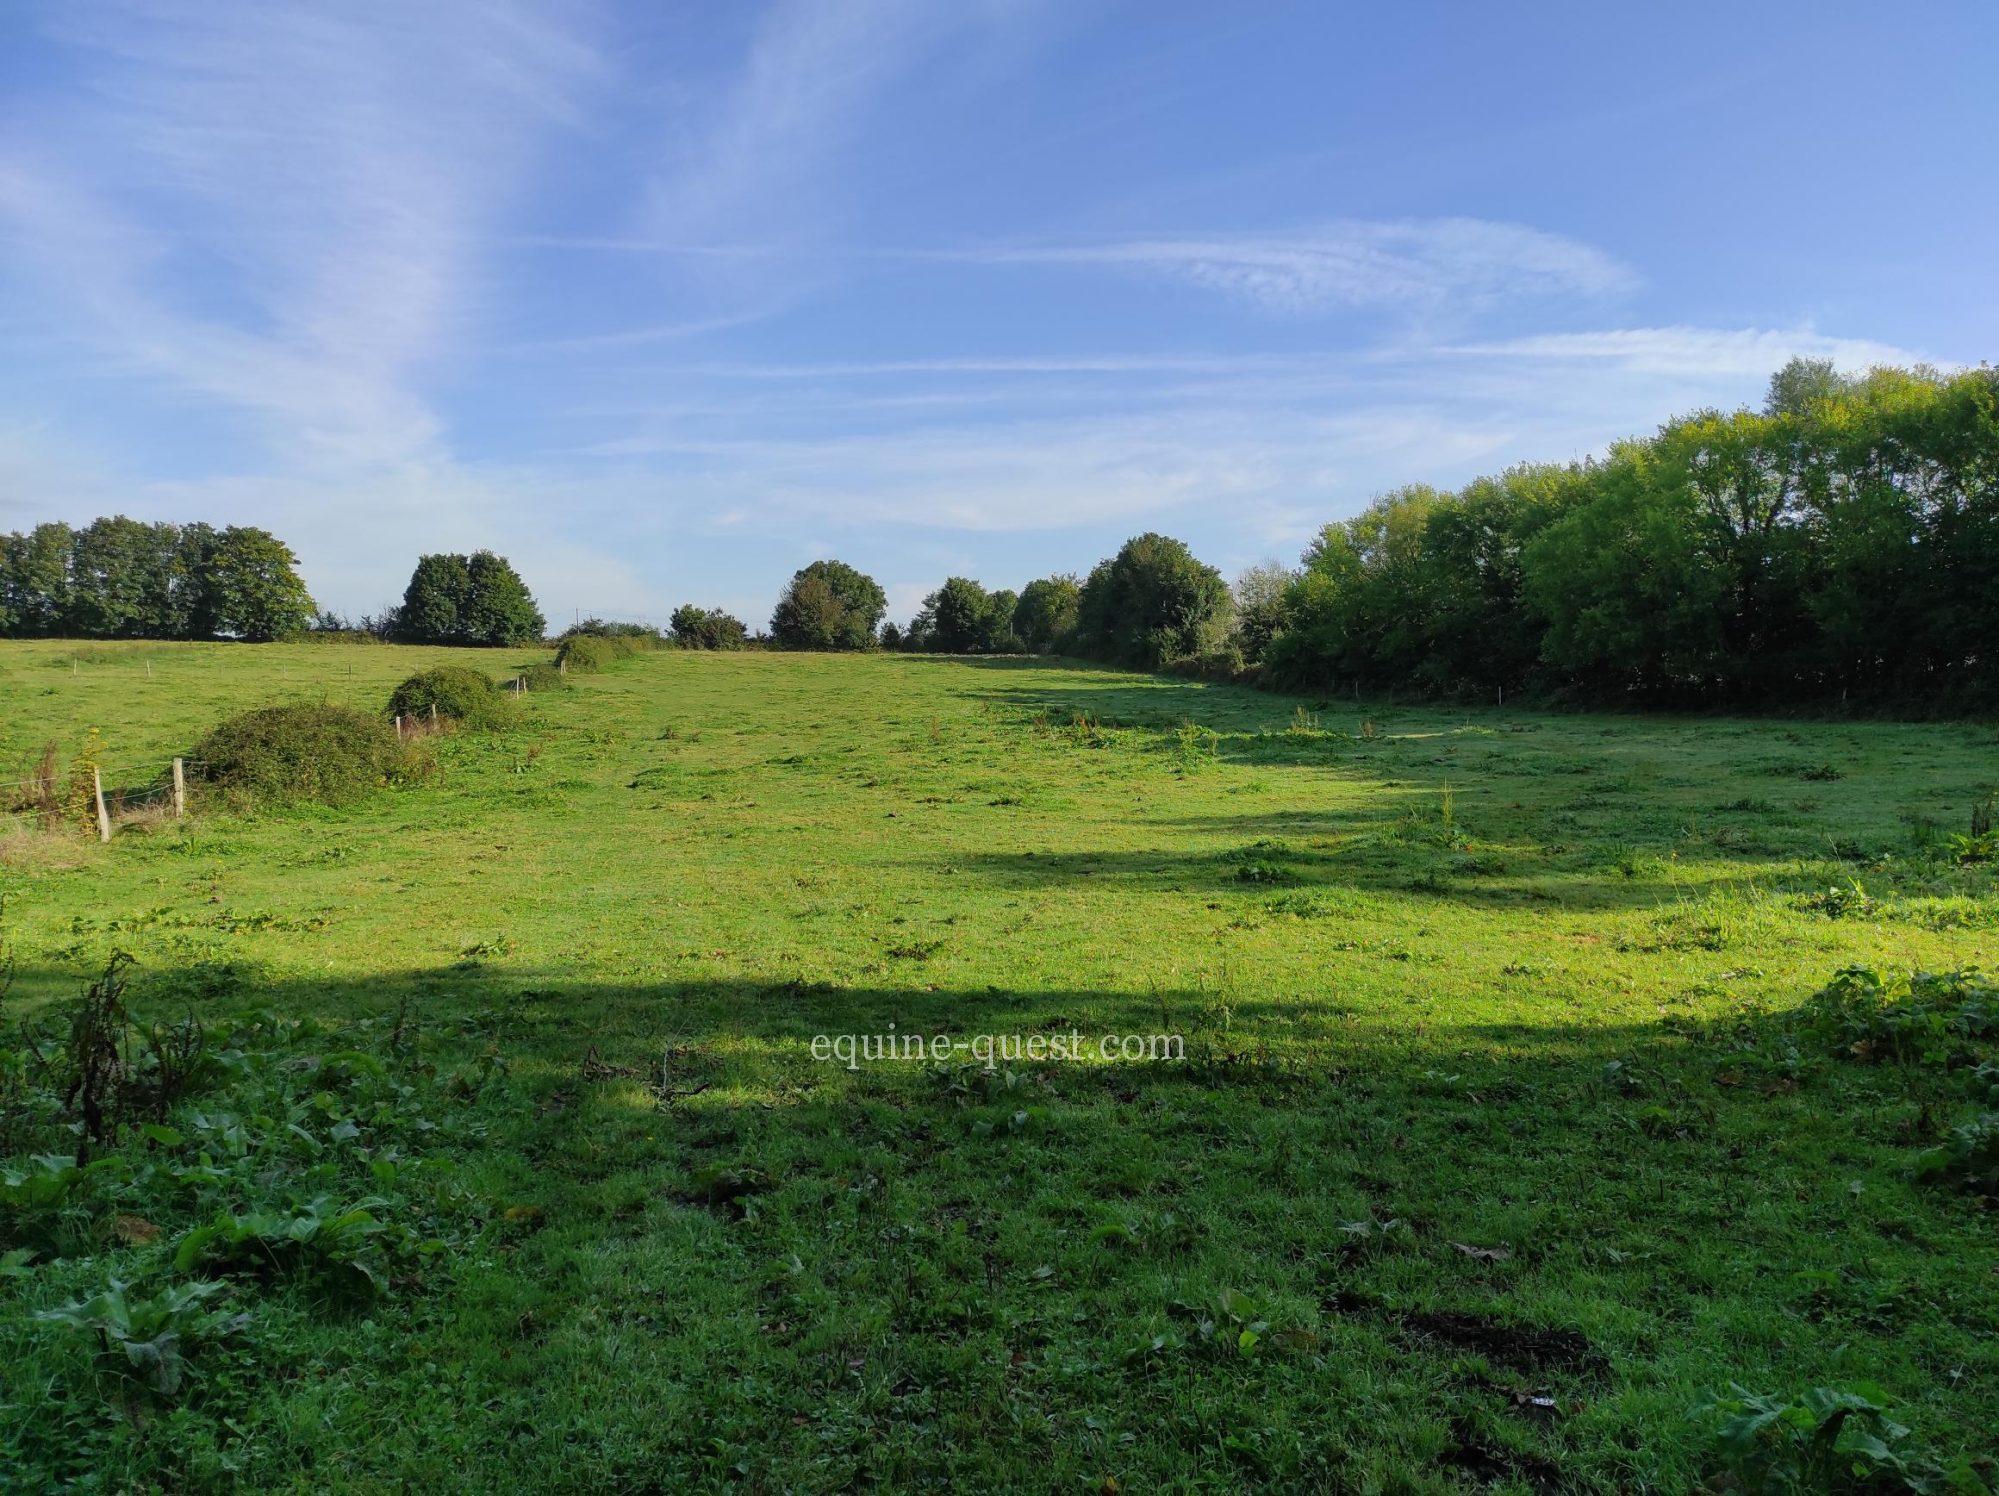 Equestrian property – Normandy -Saint Lo area